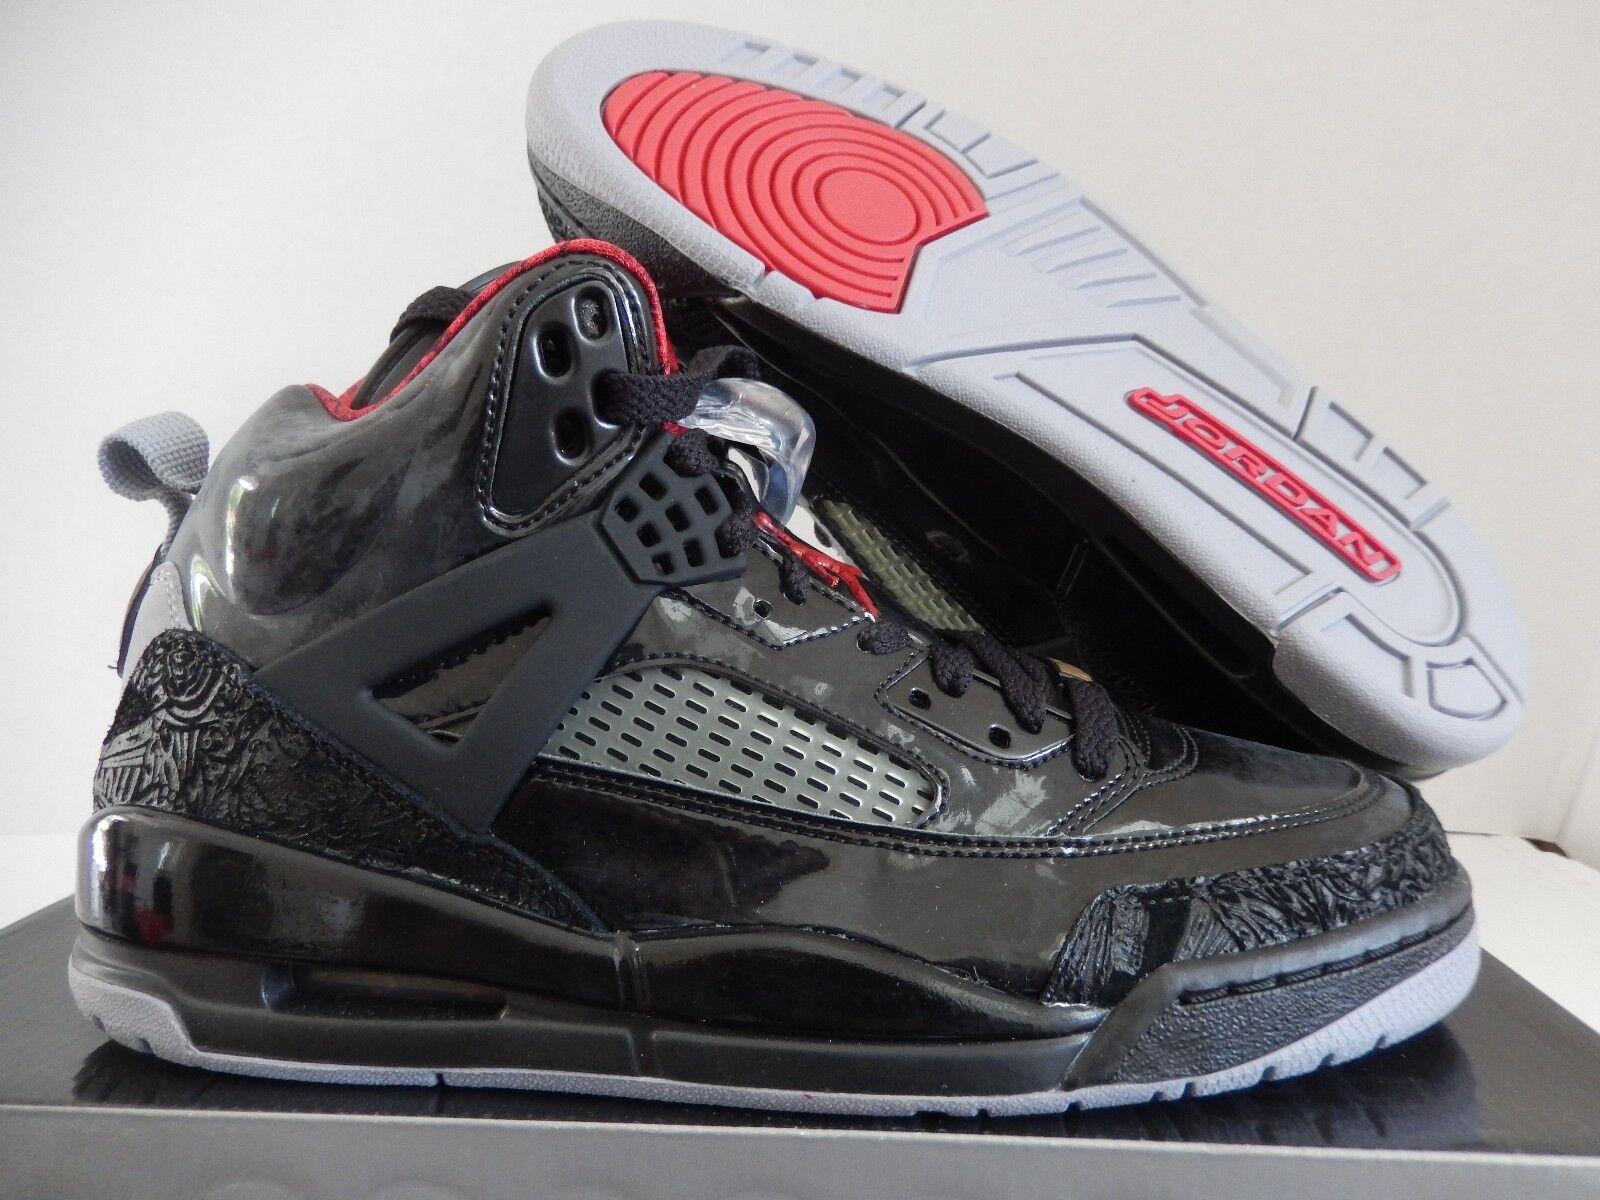 Nike air jordan jordan jordan spizike schwarz